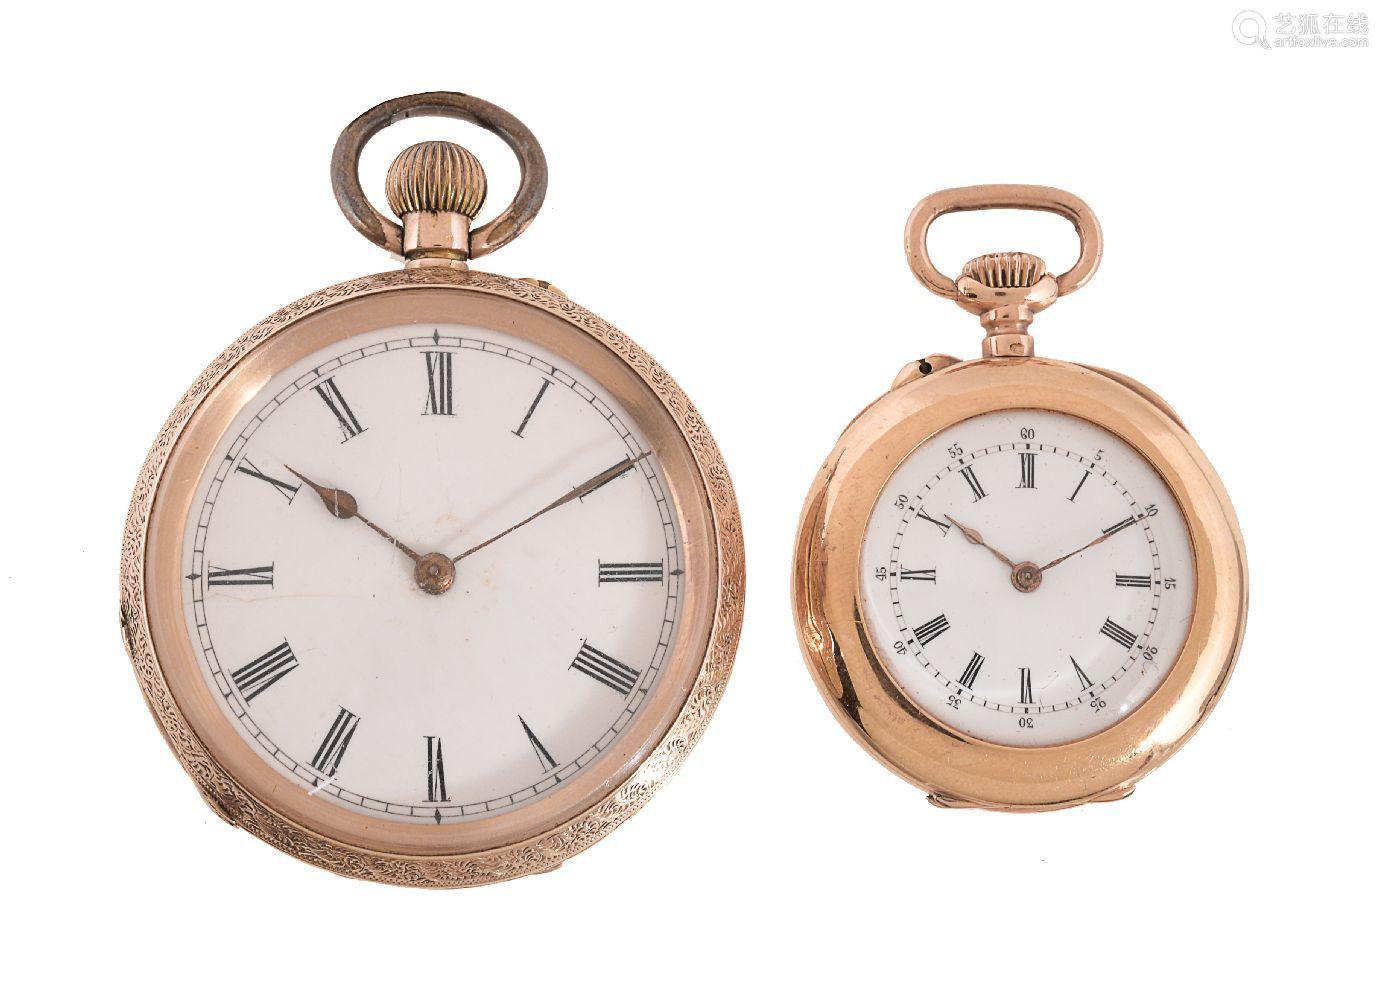 Unsigned,14 carat gold open face keyless wind pocket watch